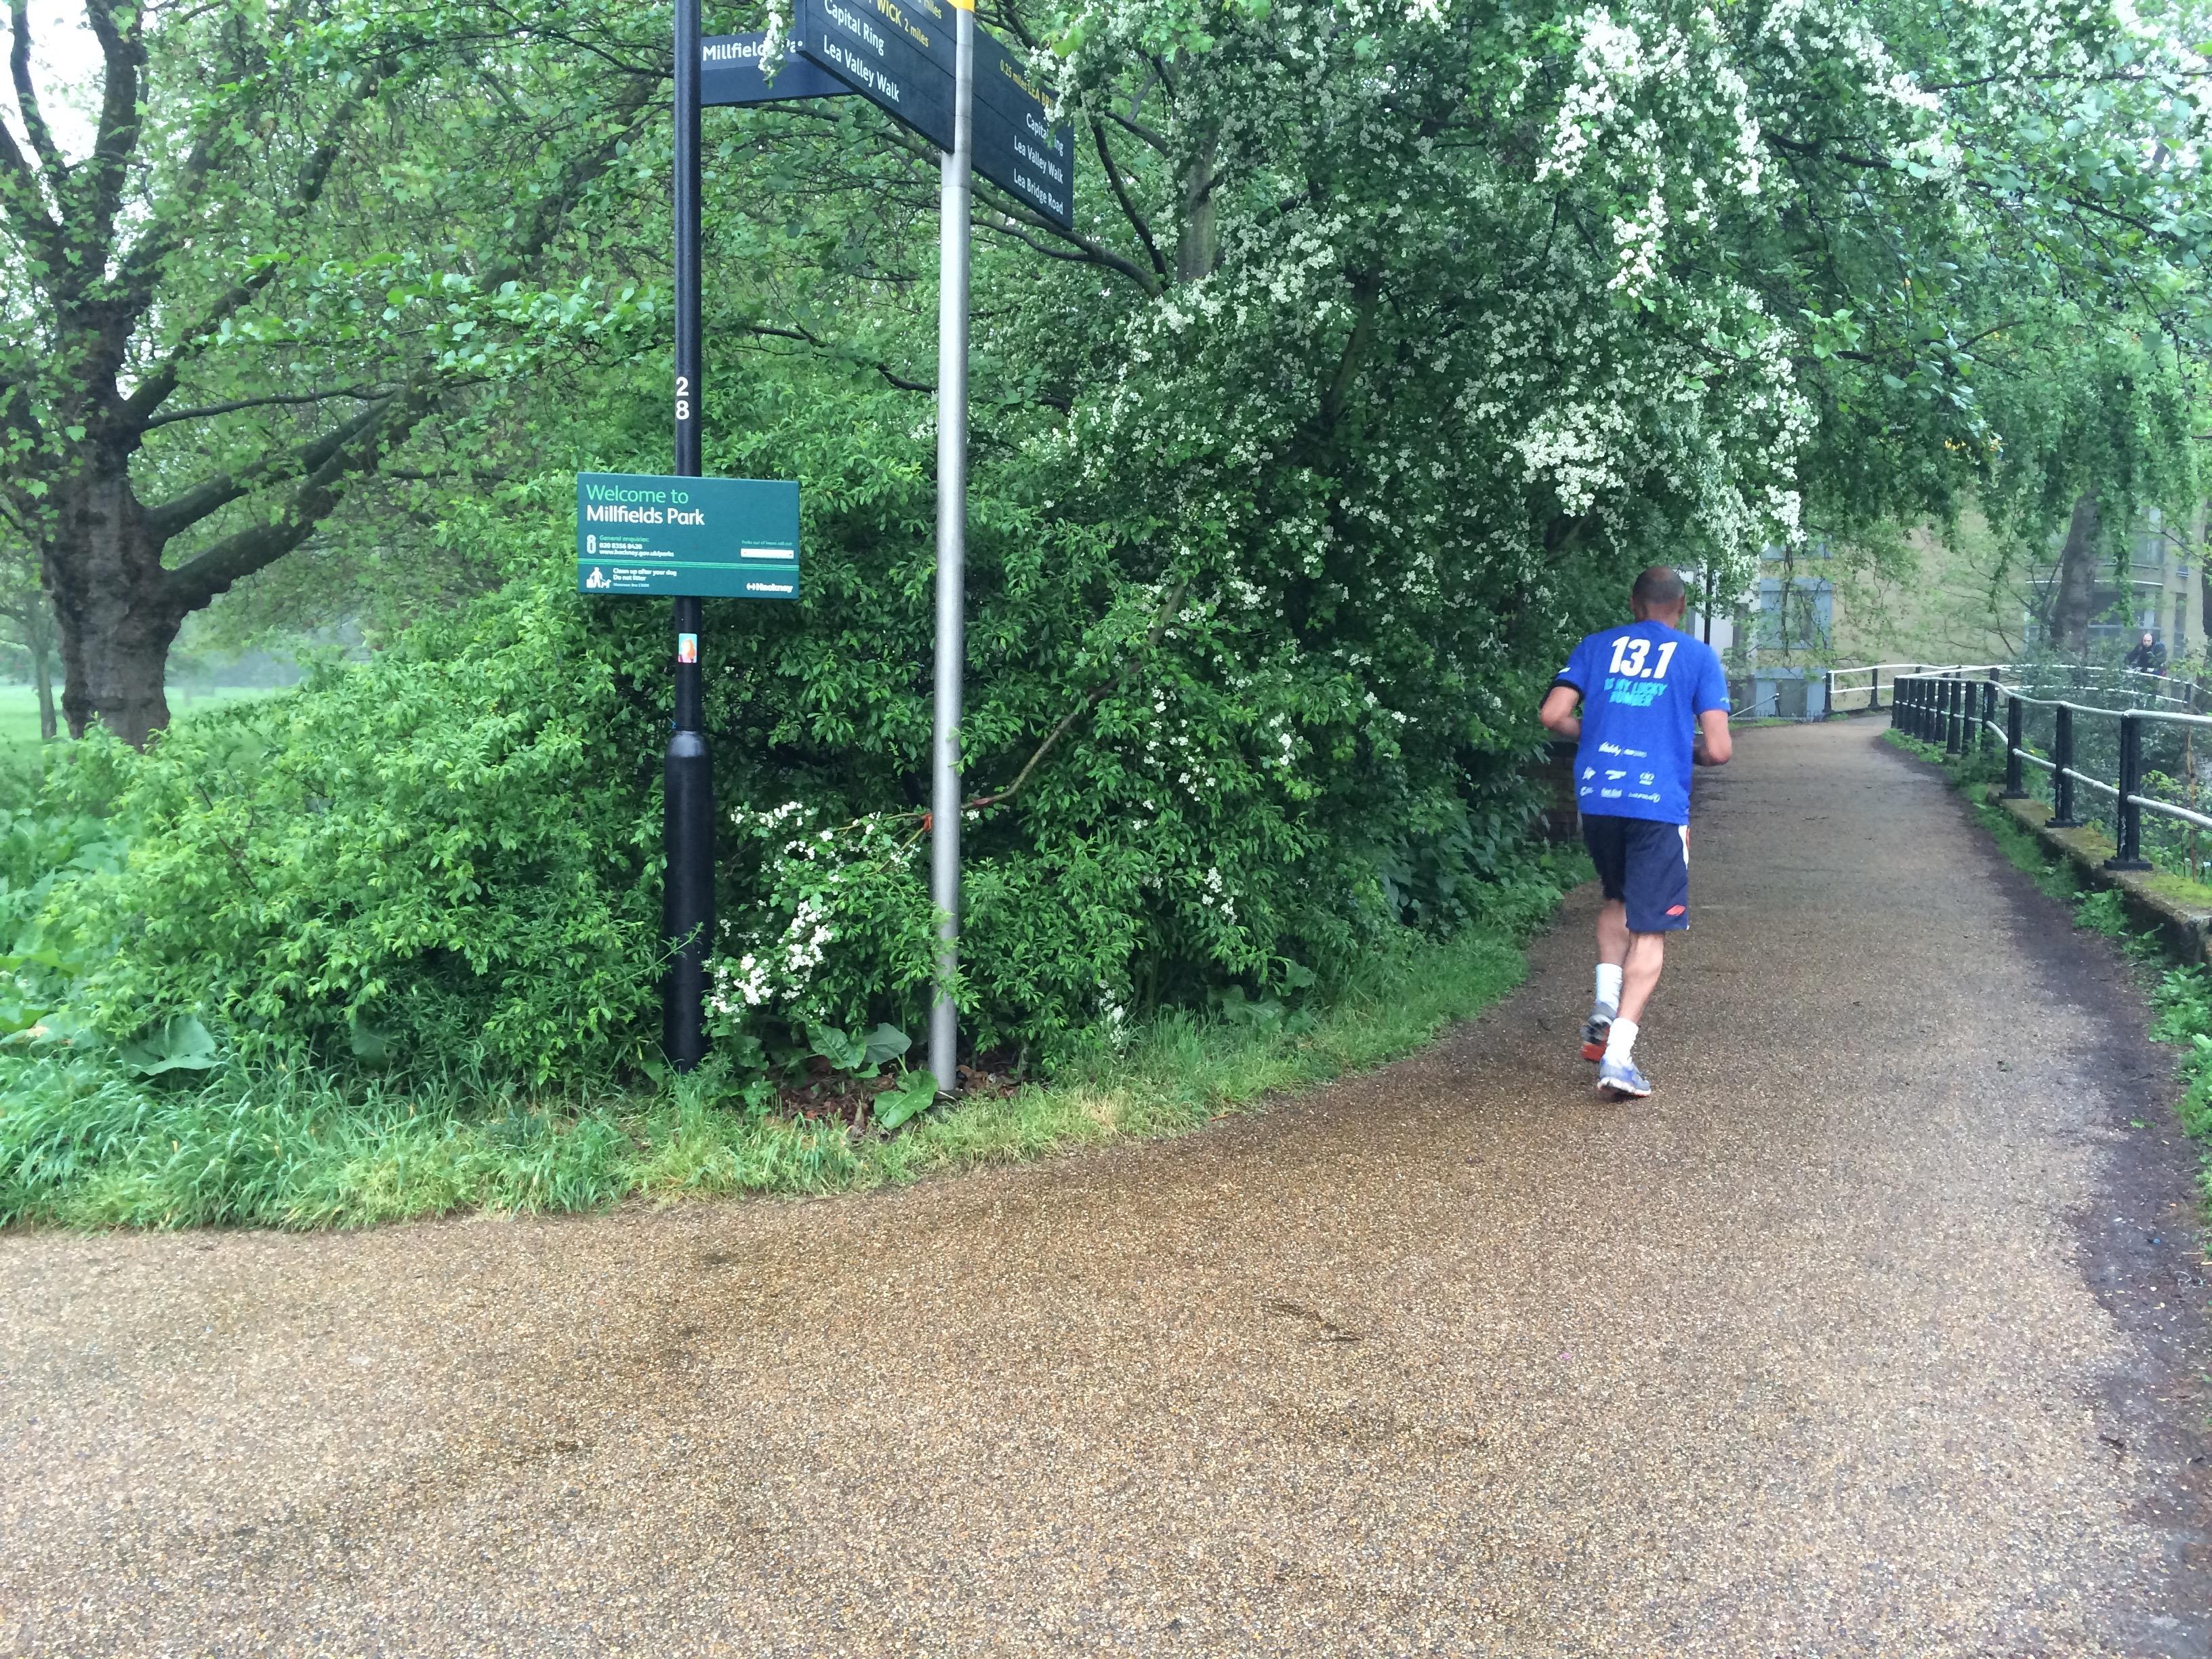 Jogging by Regents Canal, London.